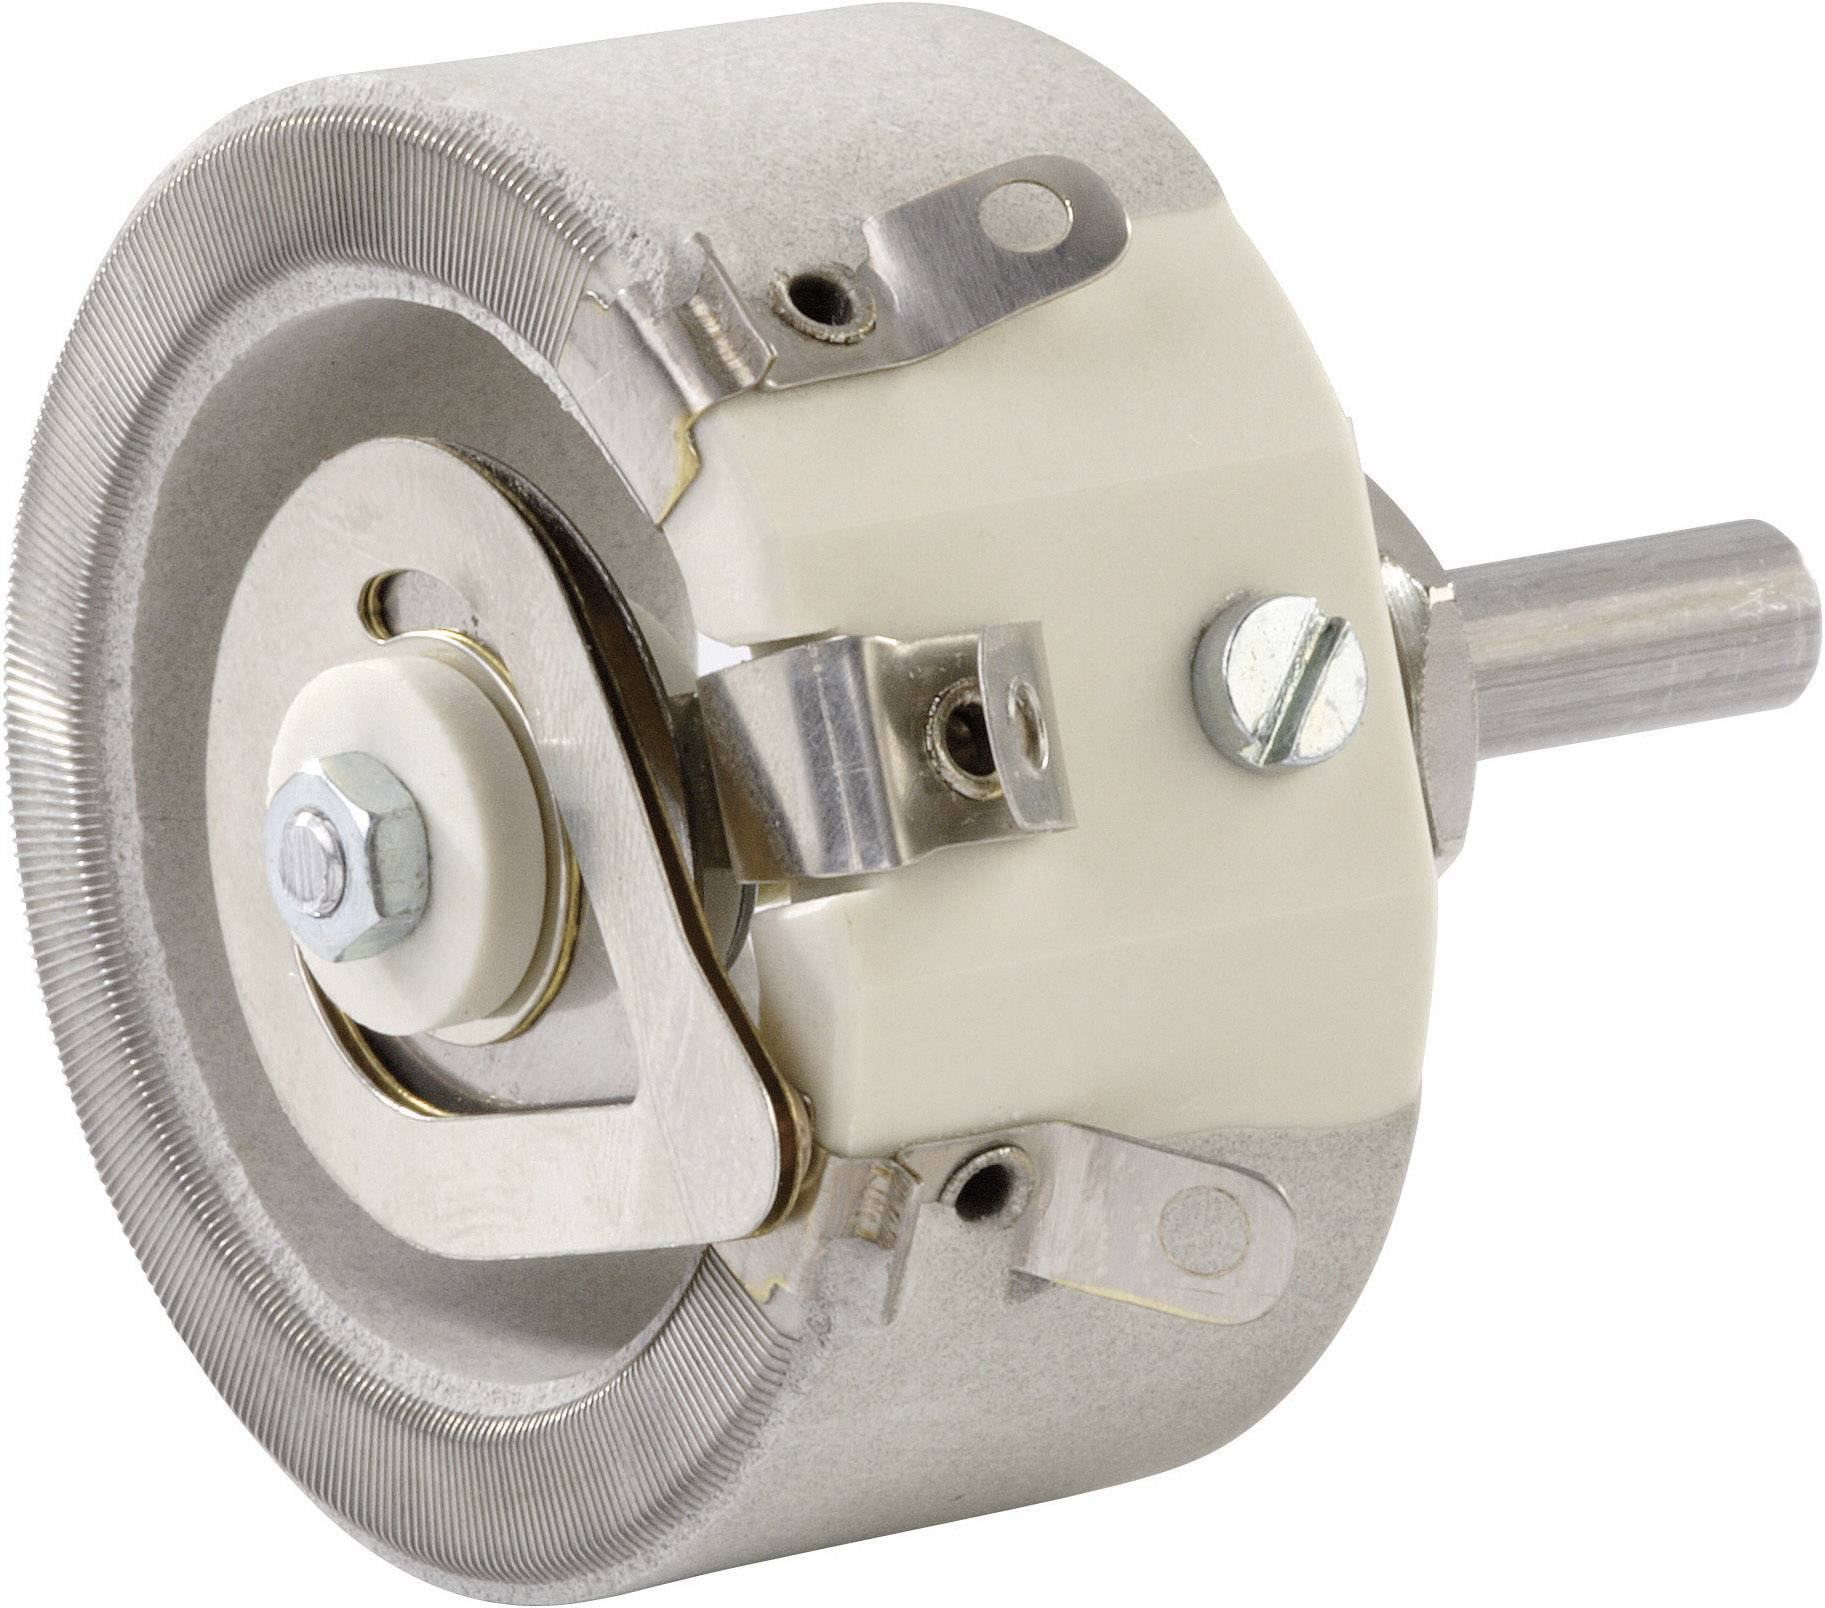 Drôtový potenciometer mono TT Electronics AB 3191006700 3191006700, 10 W, 2.2 kOhm, 1 ks